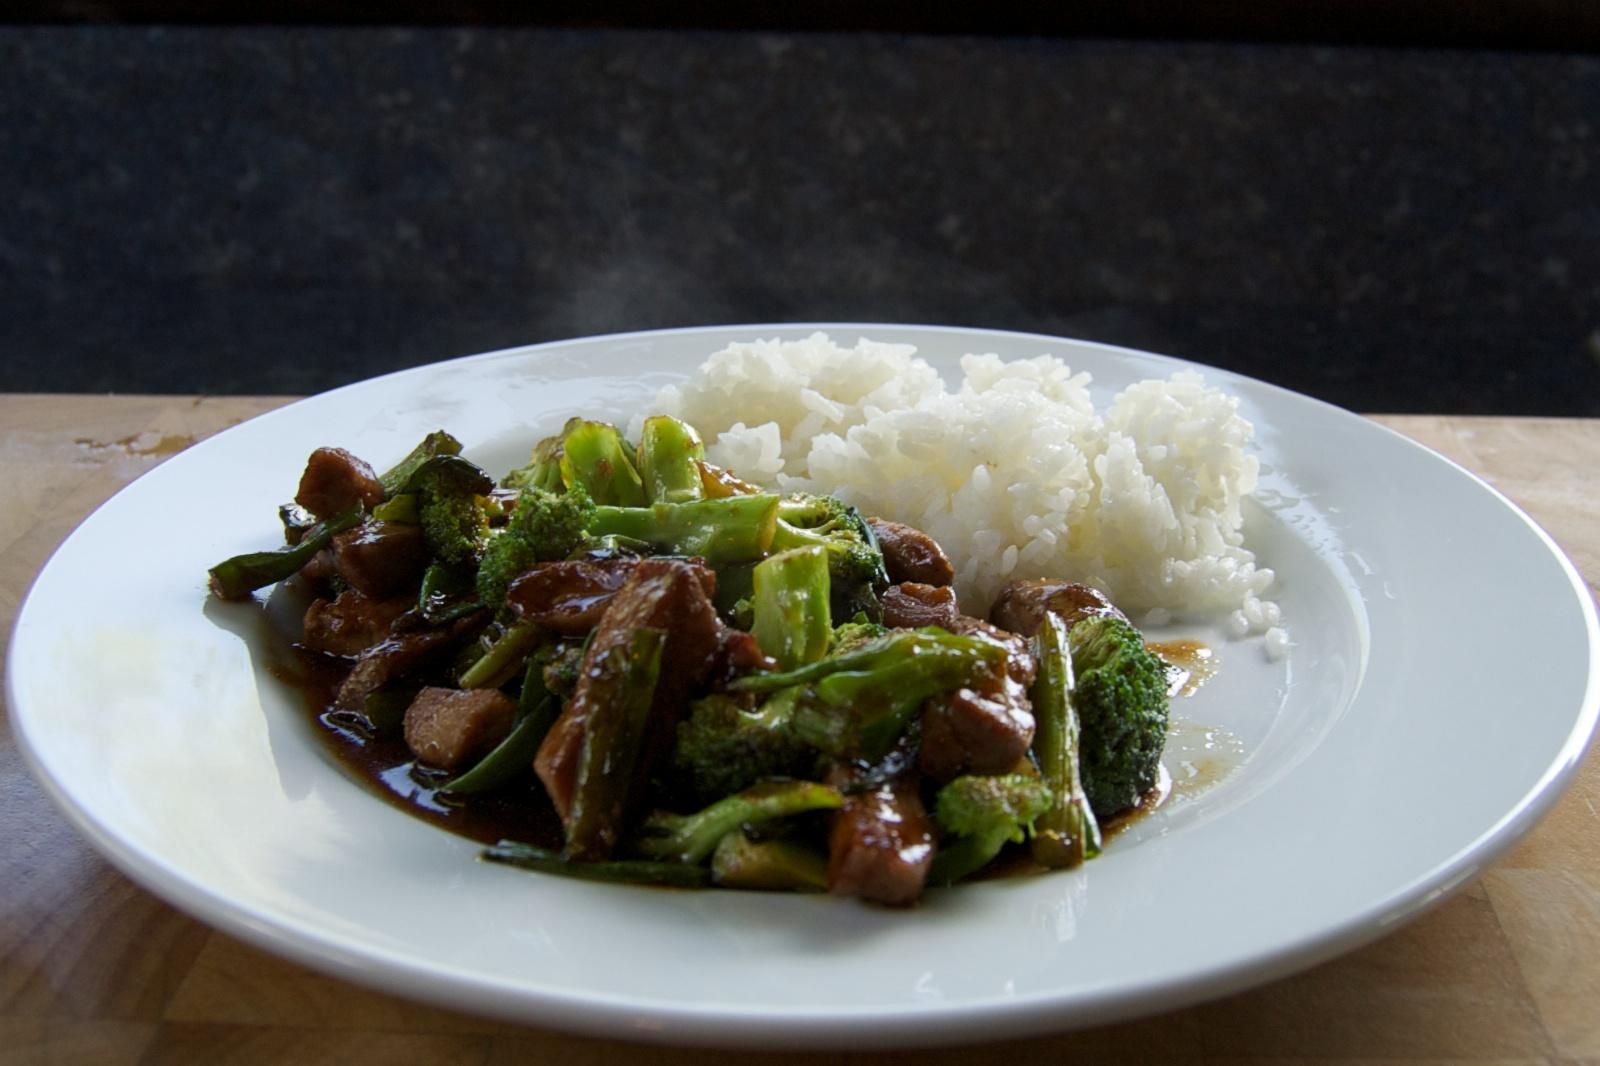 http://blog.rickk.com/food/2012/05/06/ate.2012.05.06.l.jpg